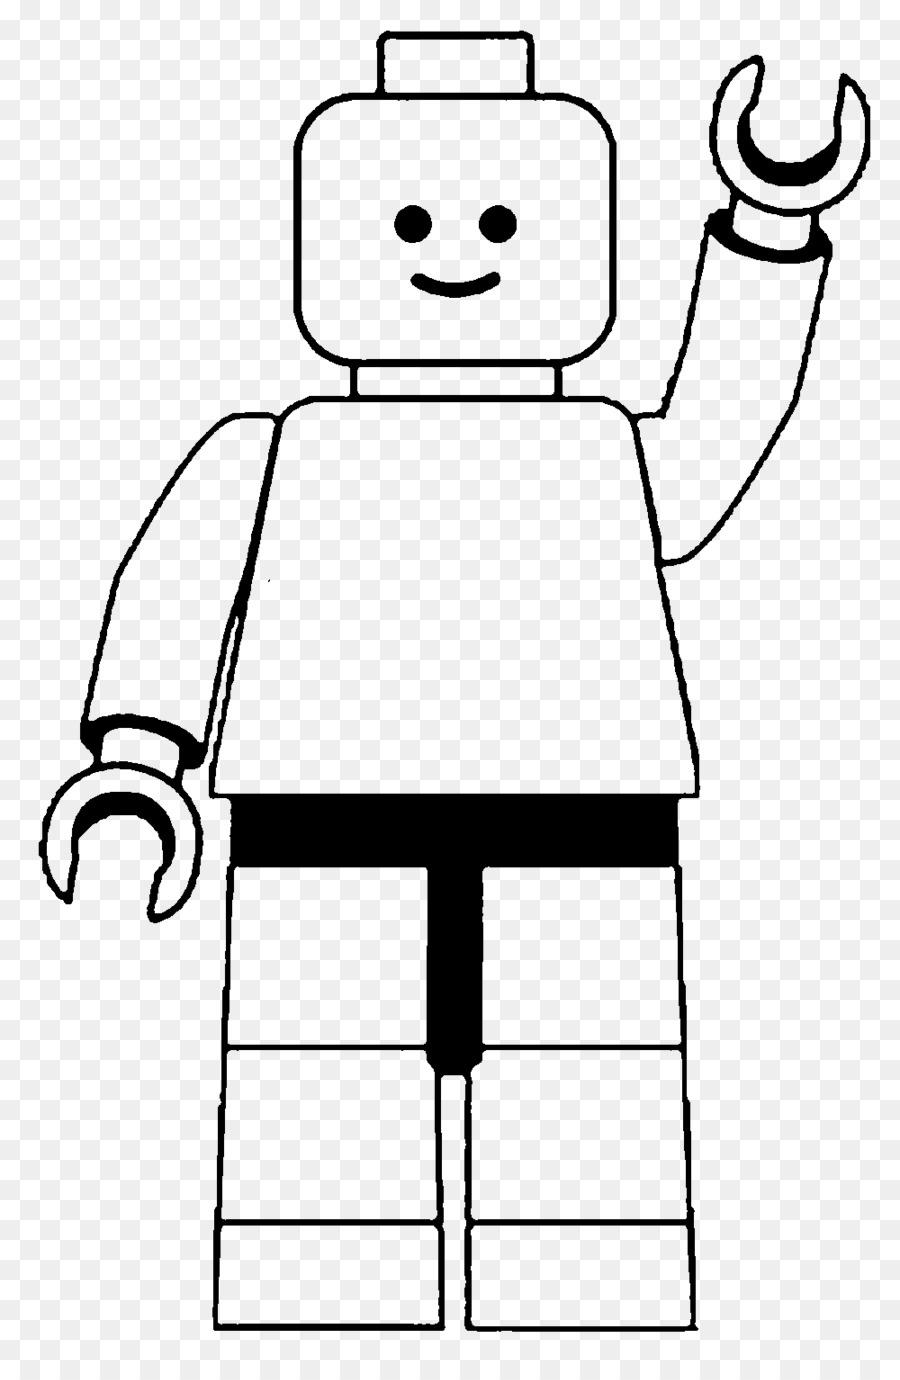 city cartoon png download - 1000*1517 - free transparent lego png download.  - cleanpng / kisspng  cleanpng